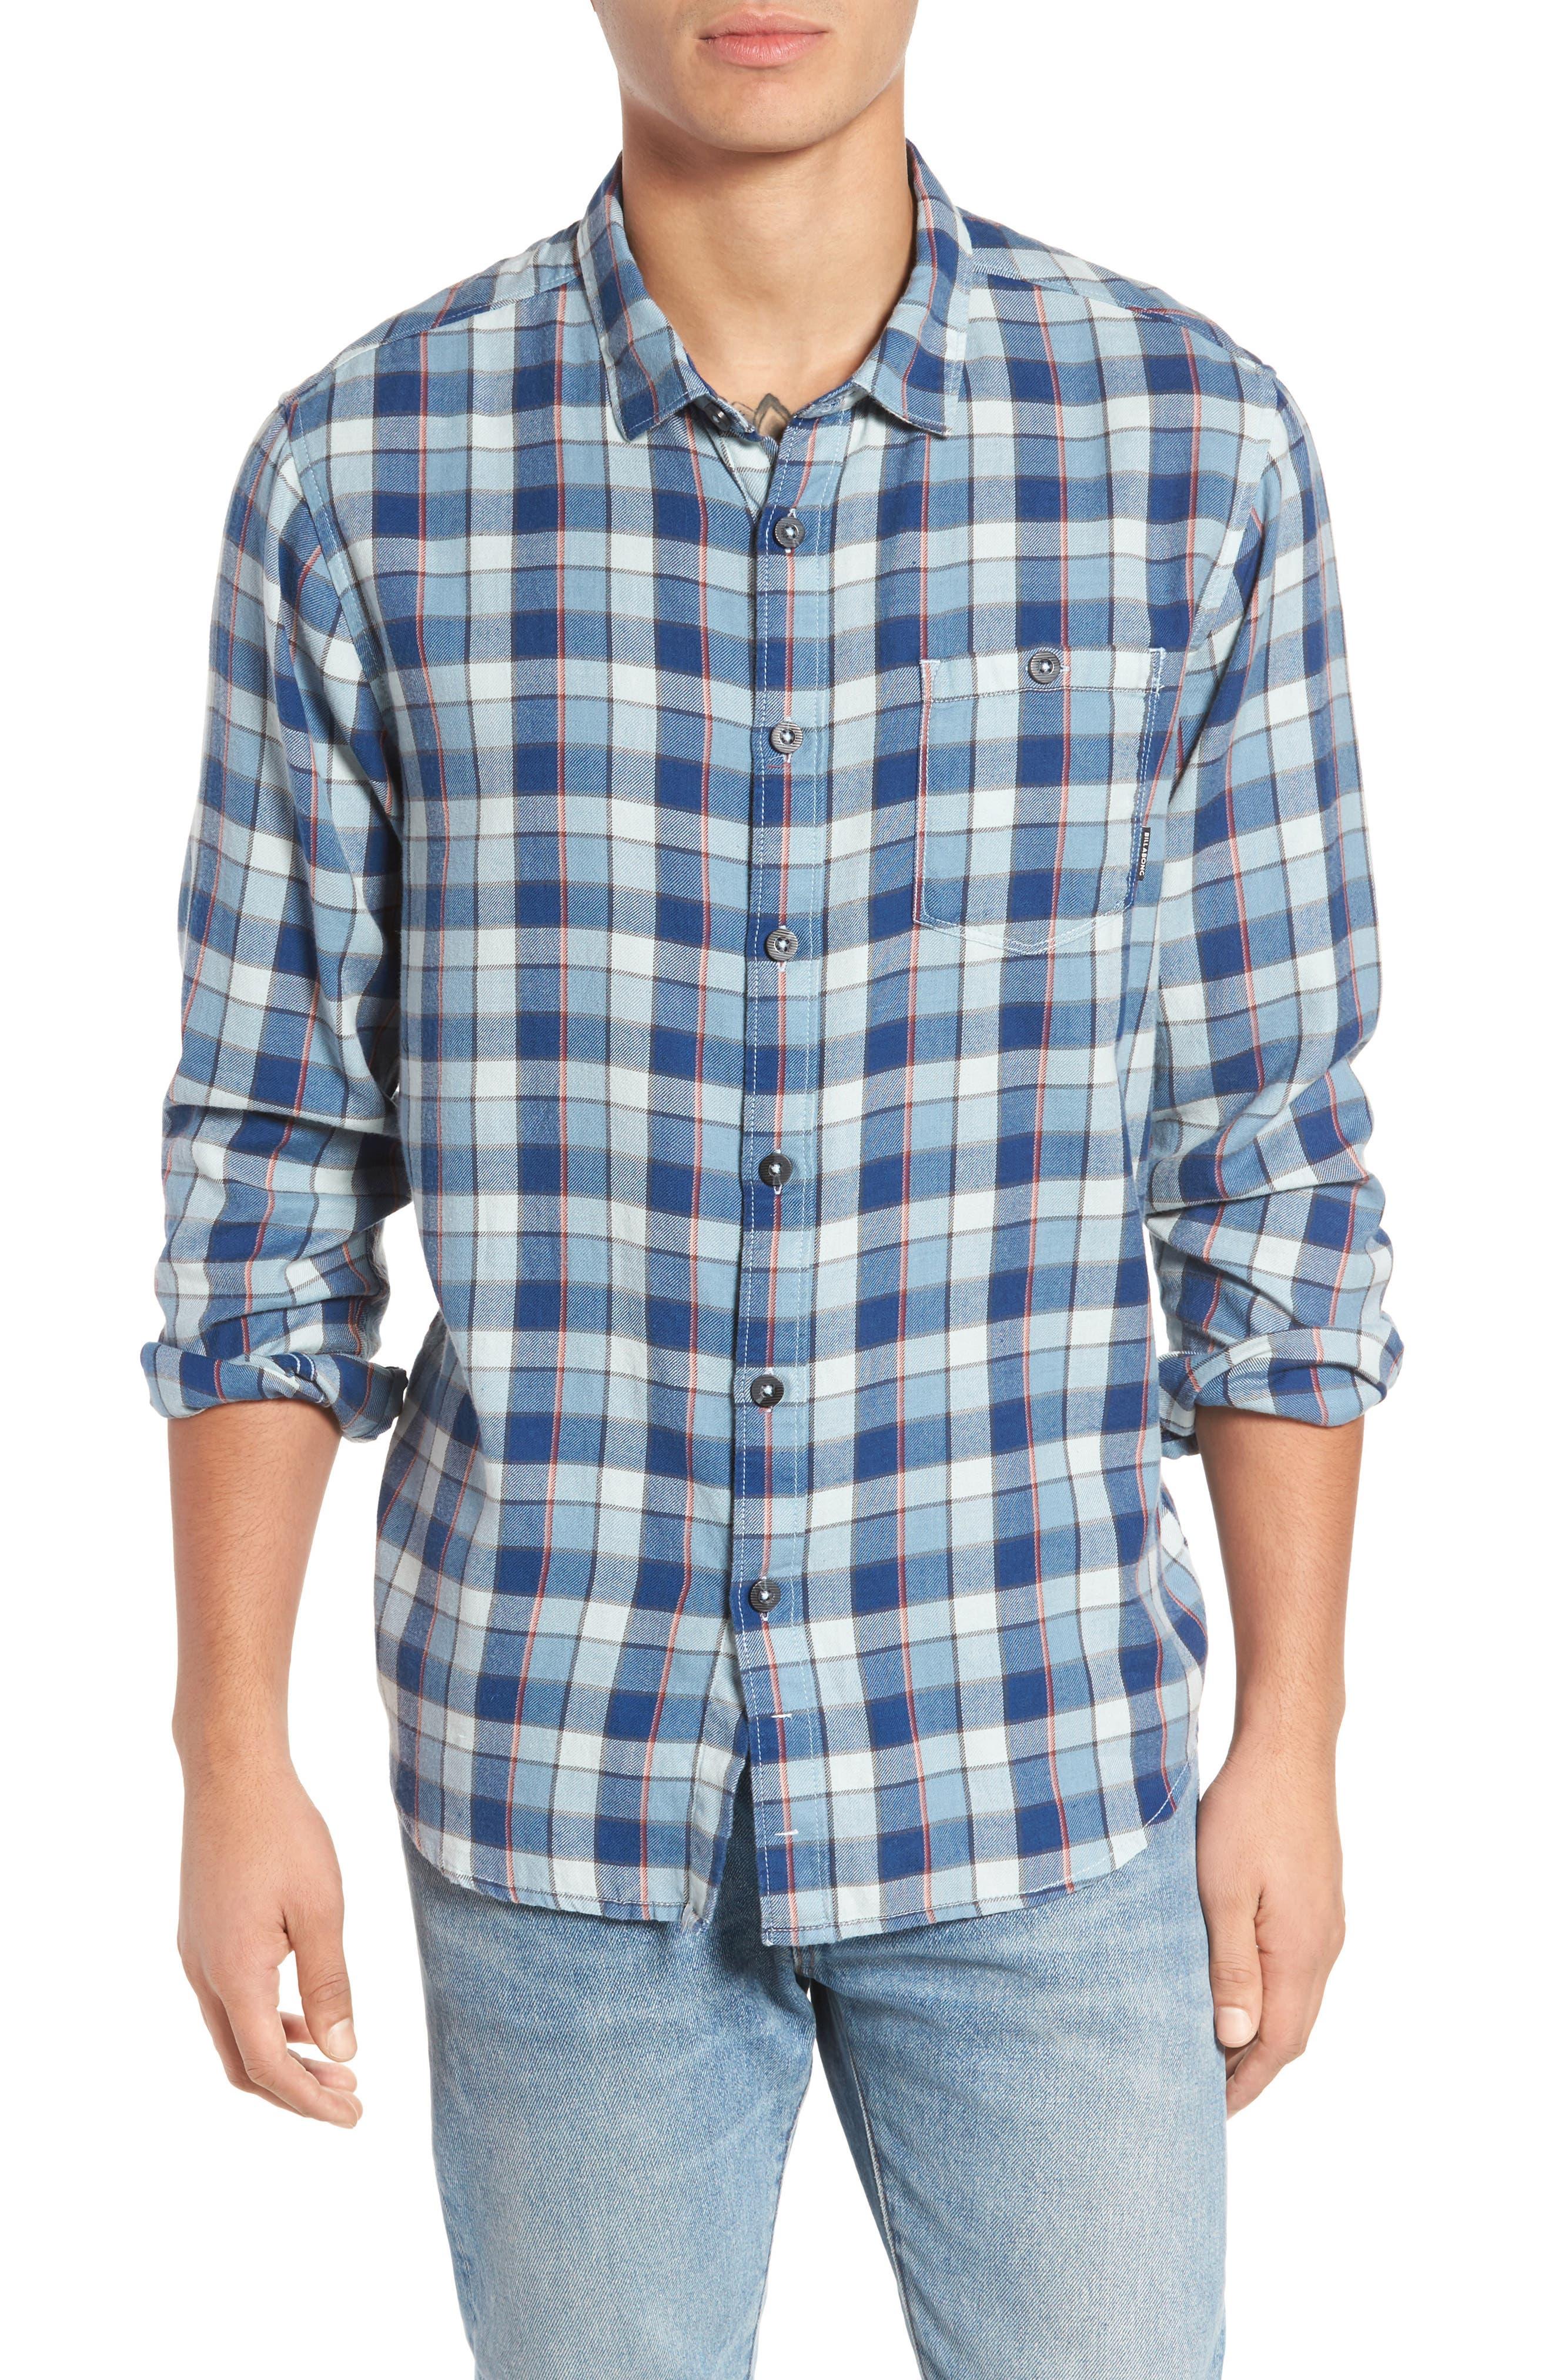 Bilabong Freemont Flannel Shirt,                         Main,                         color, Blue